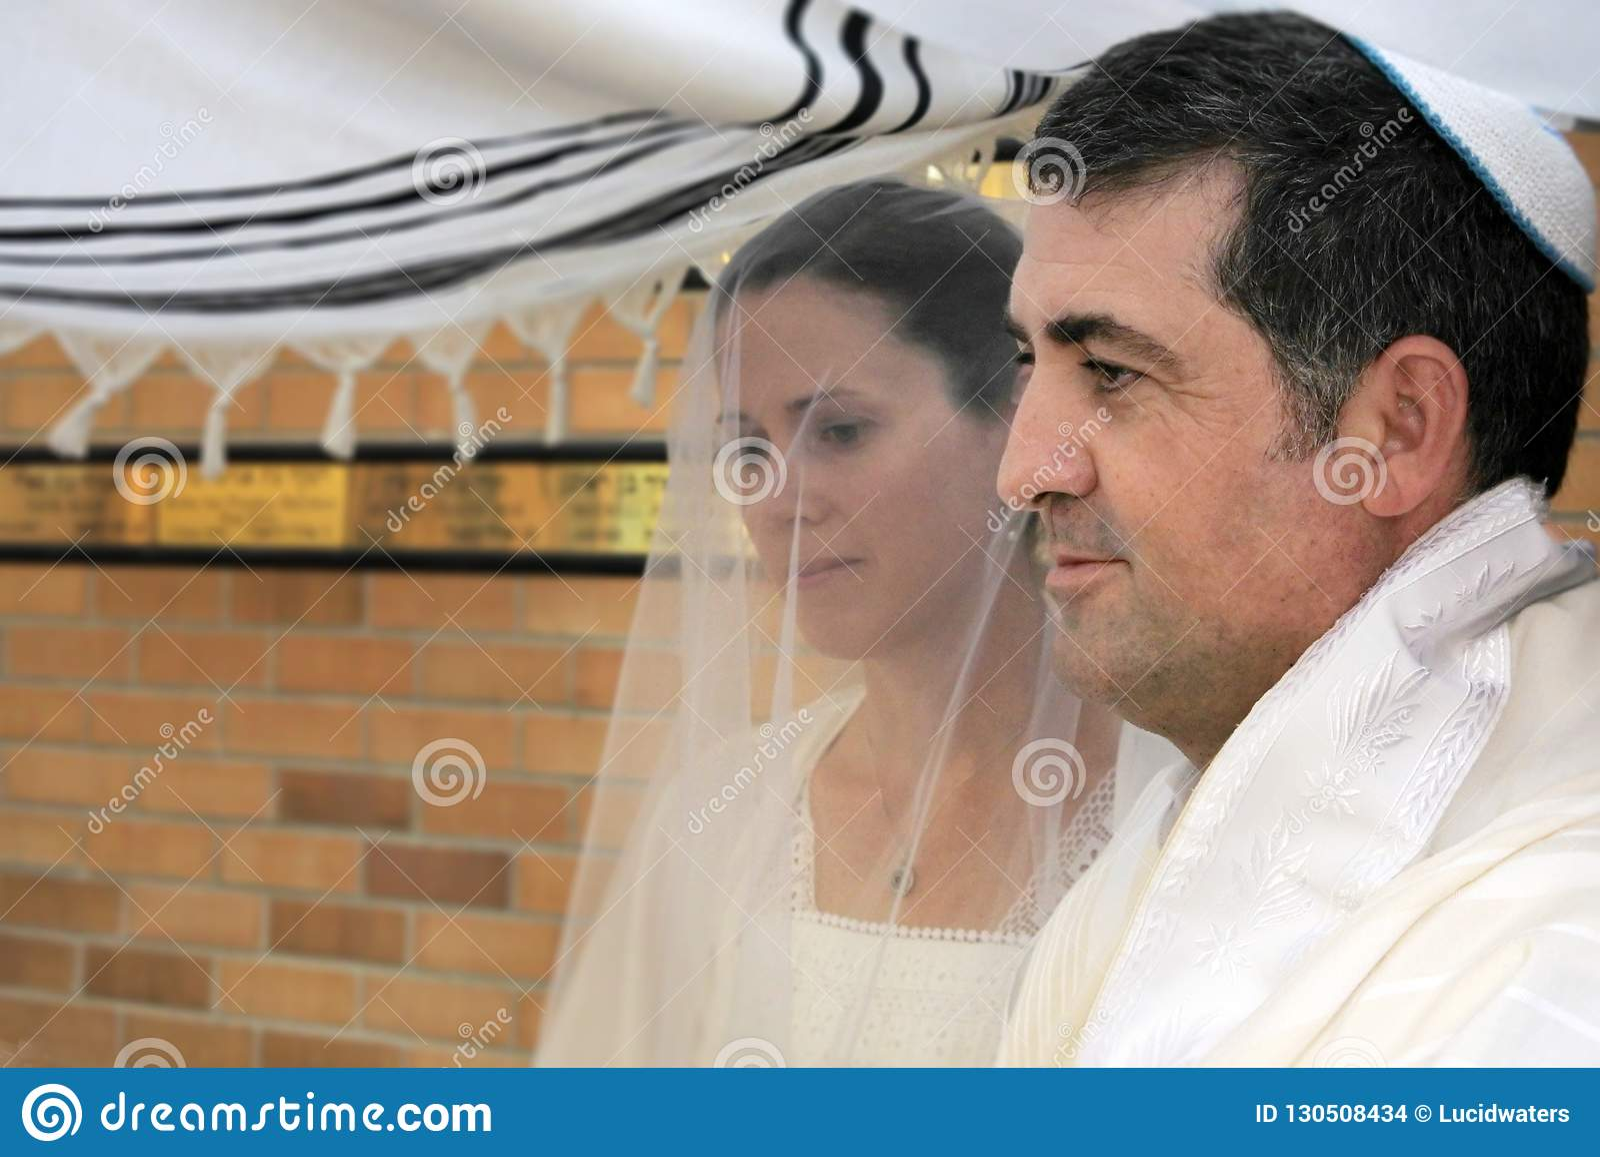 Jewish Bride And A Bridegroom Wedding Ceremony Stock Photo Image Of Jewish Emotion 130508434